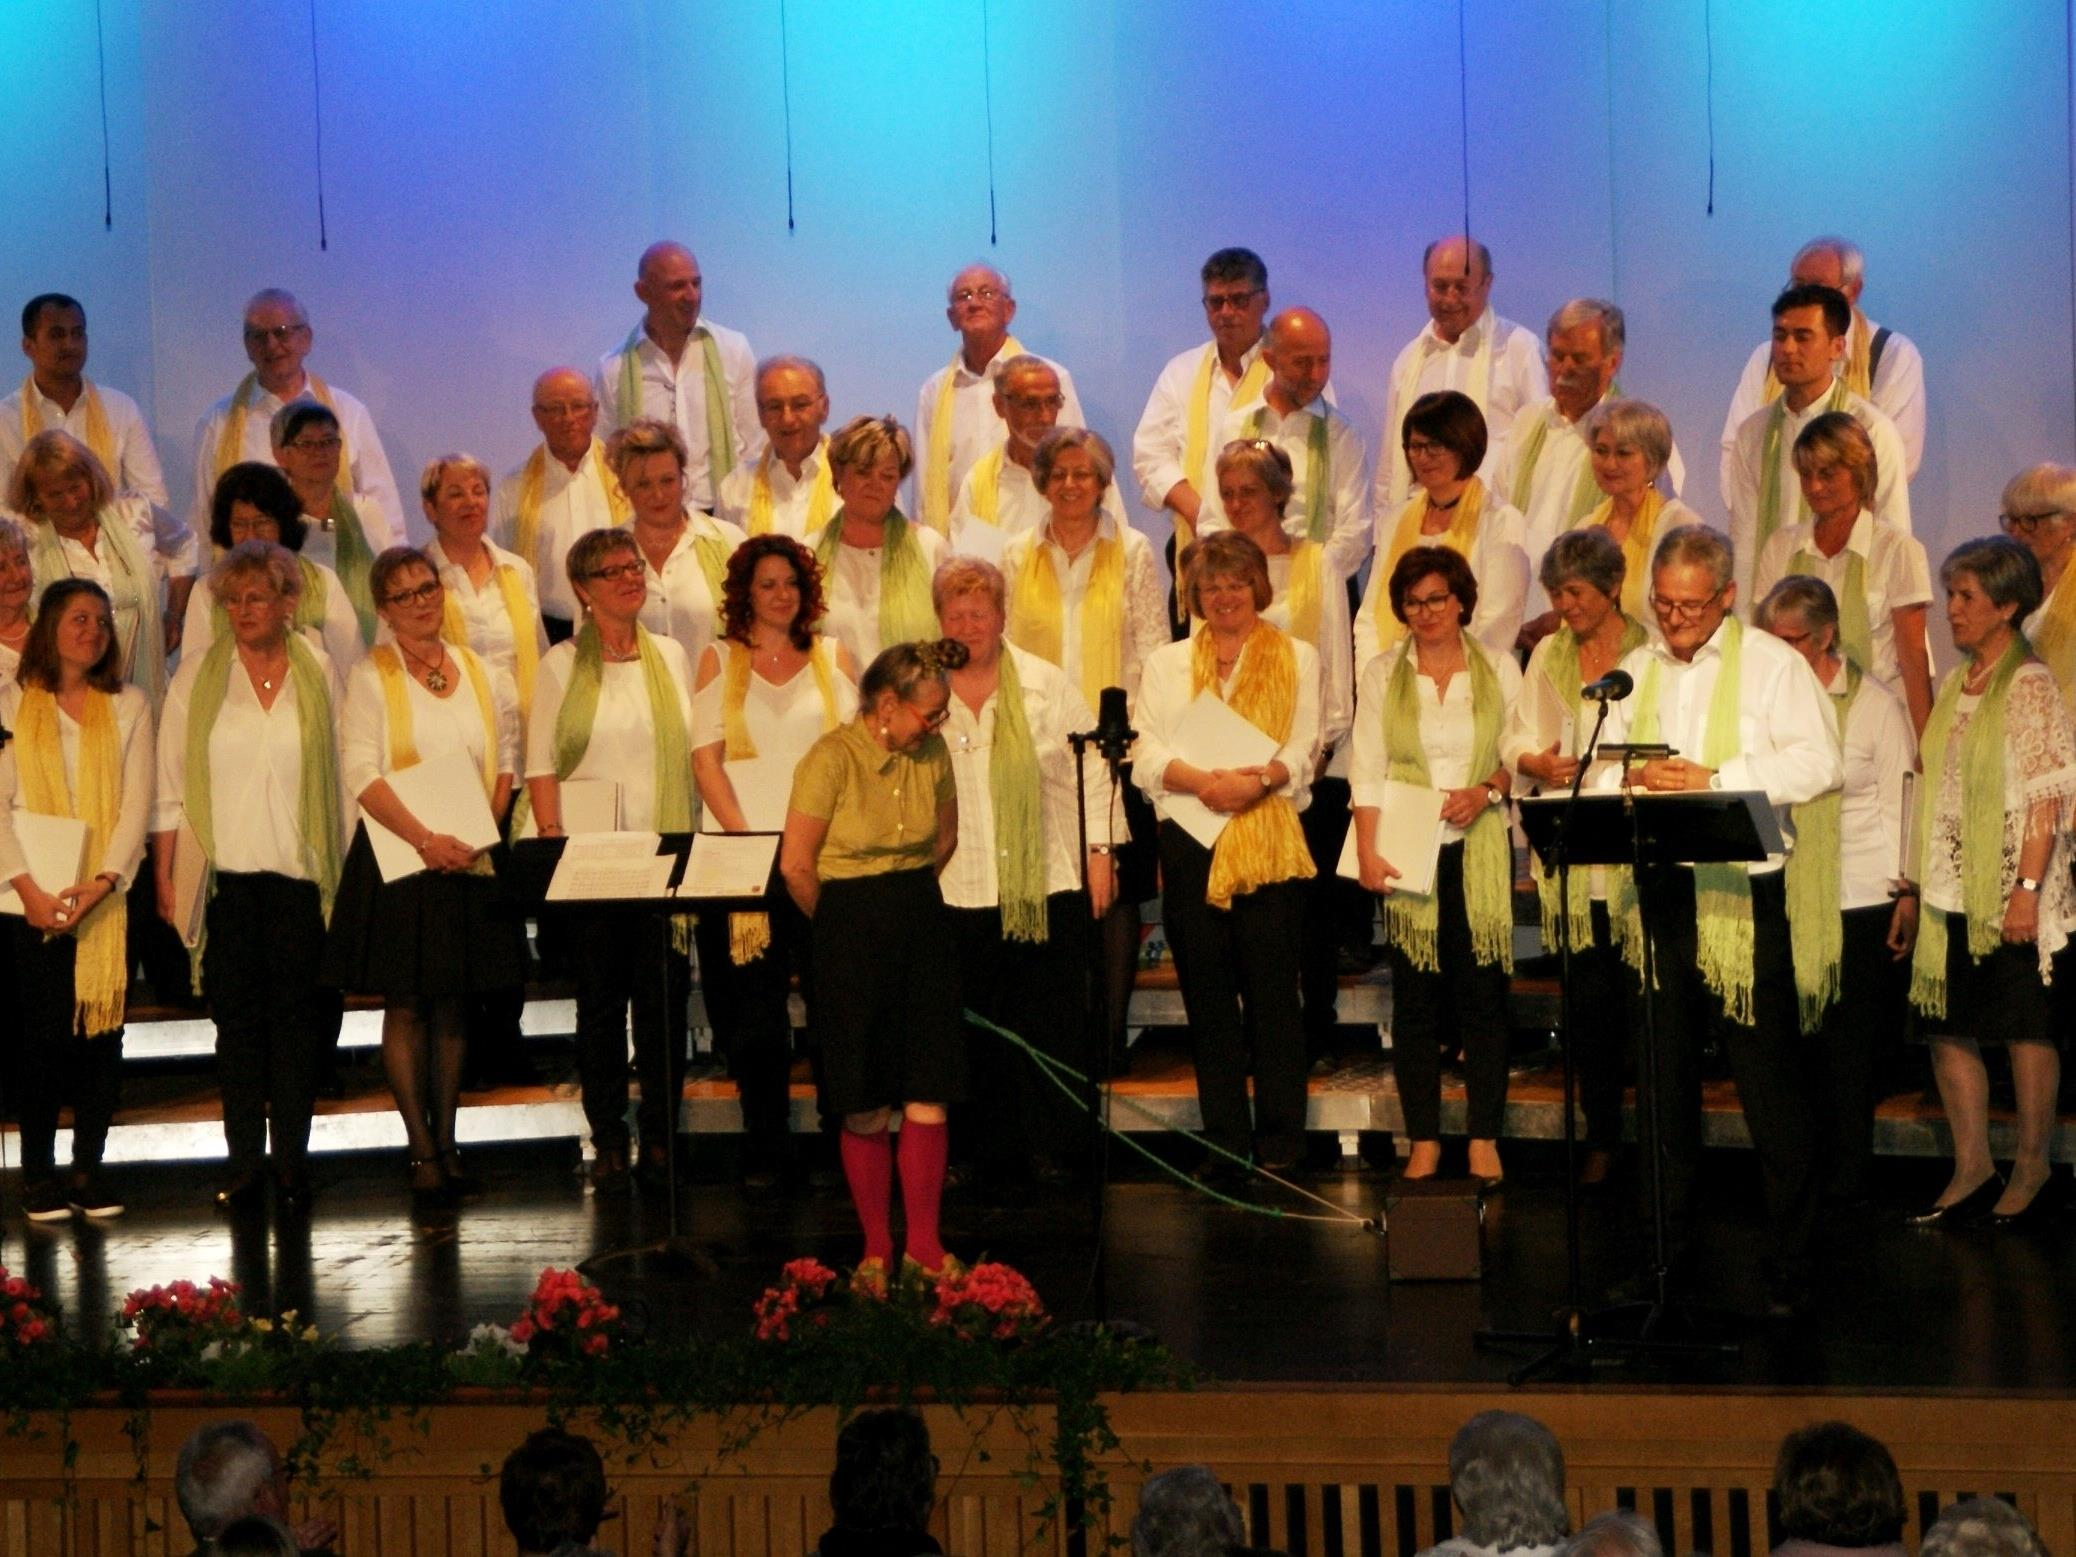 Gesangverein Konkordia feiert 160jähriges Jubiläum